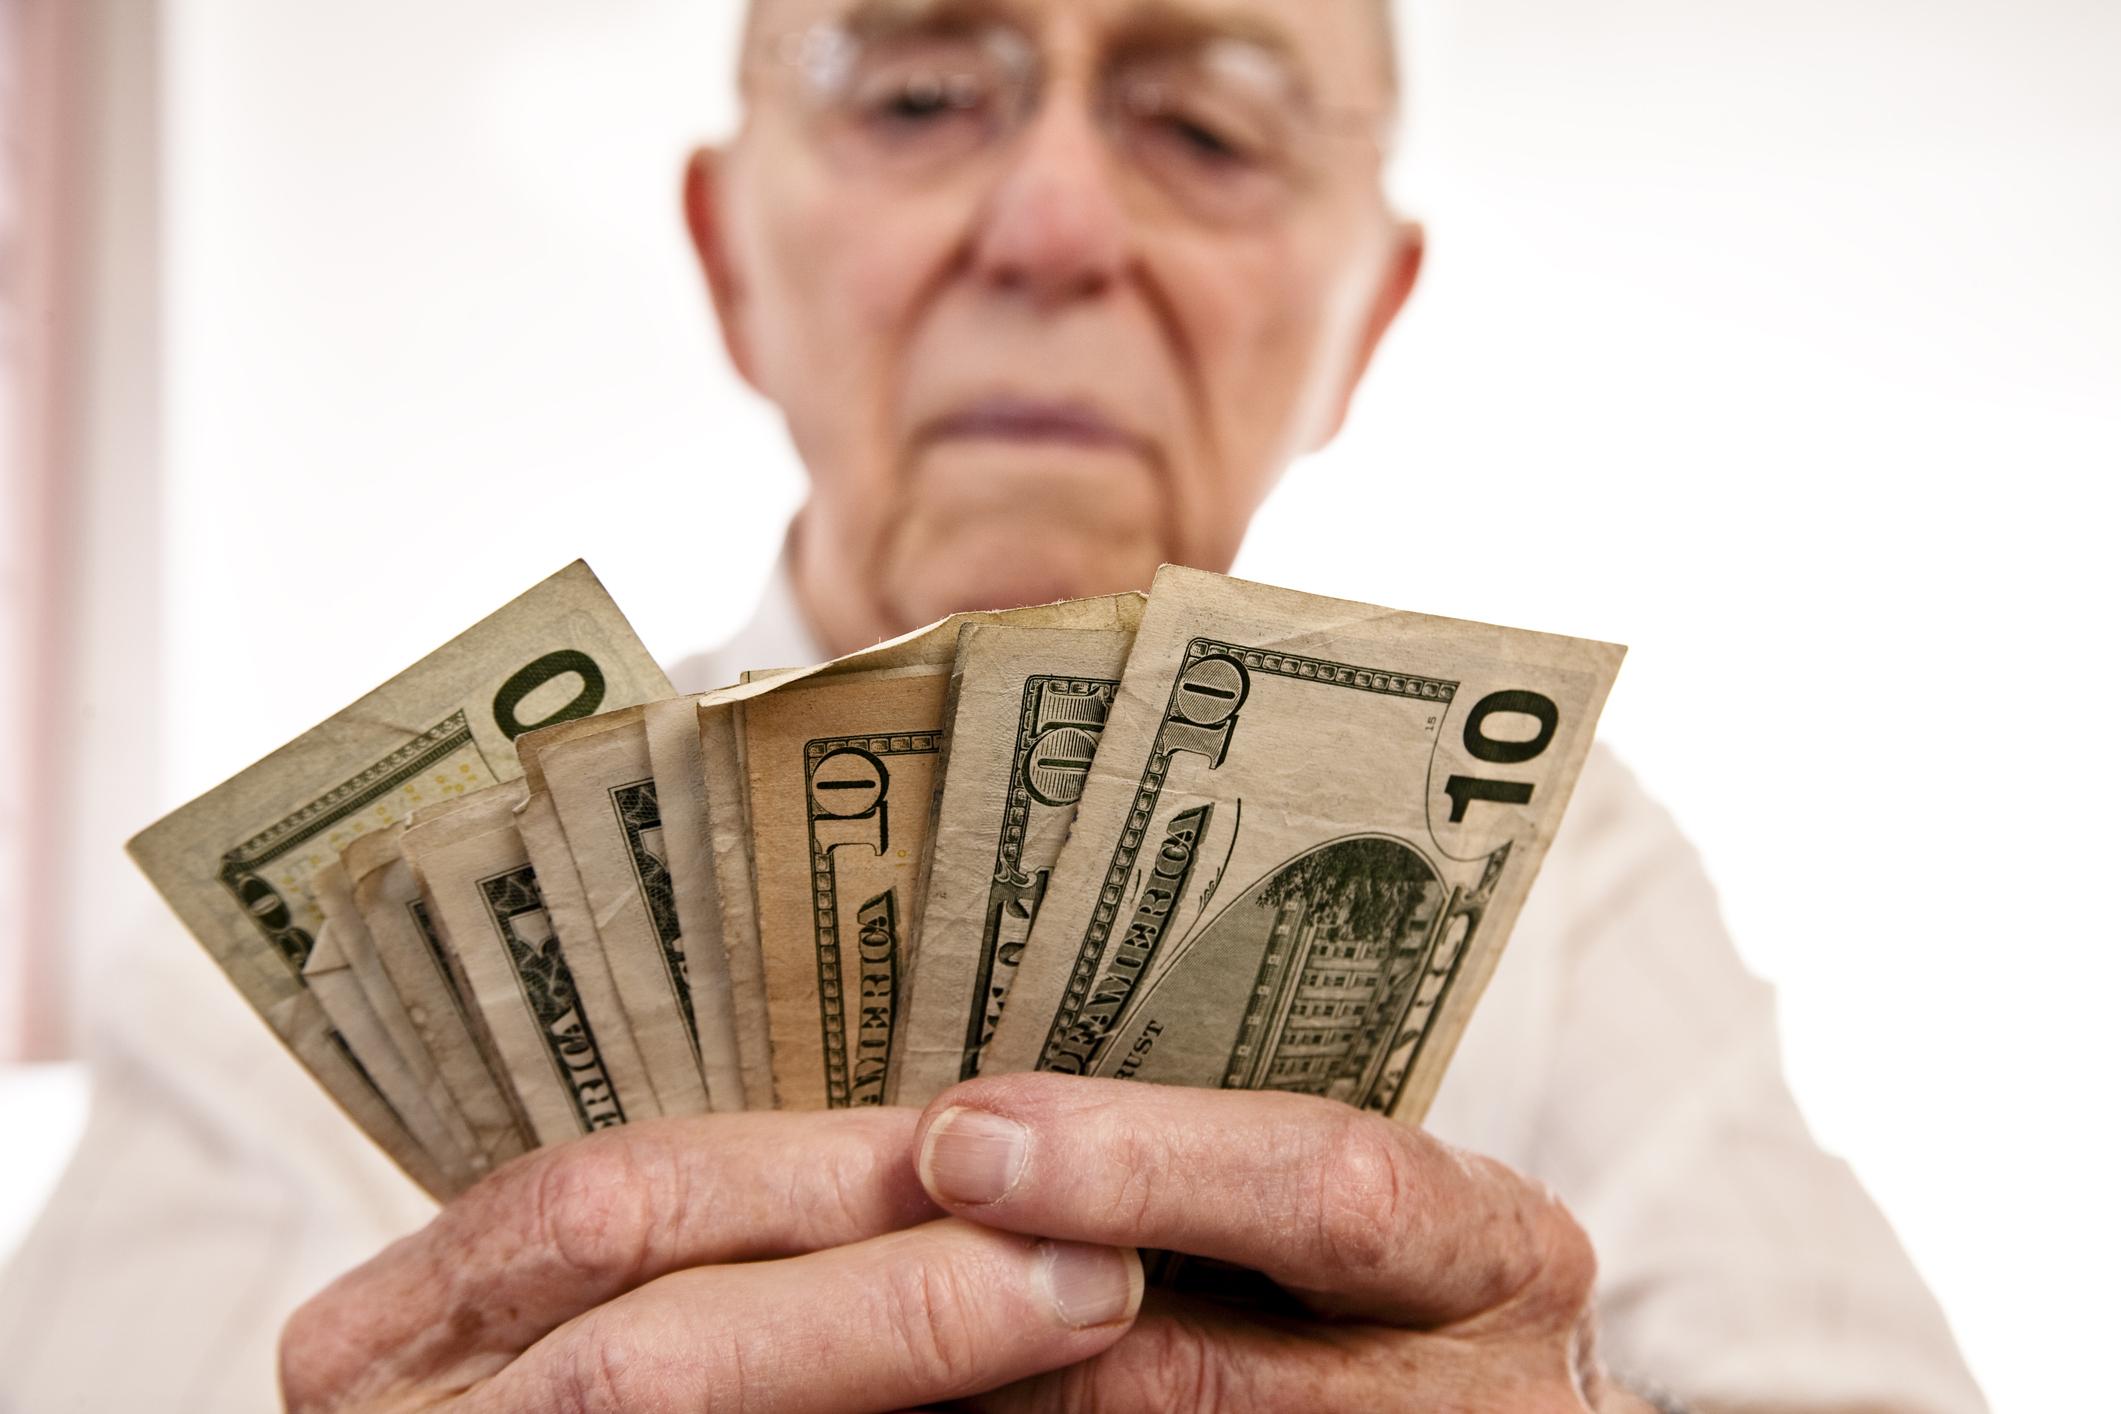 Male senior citizen fanning $10 bills in his hands